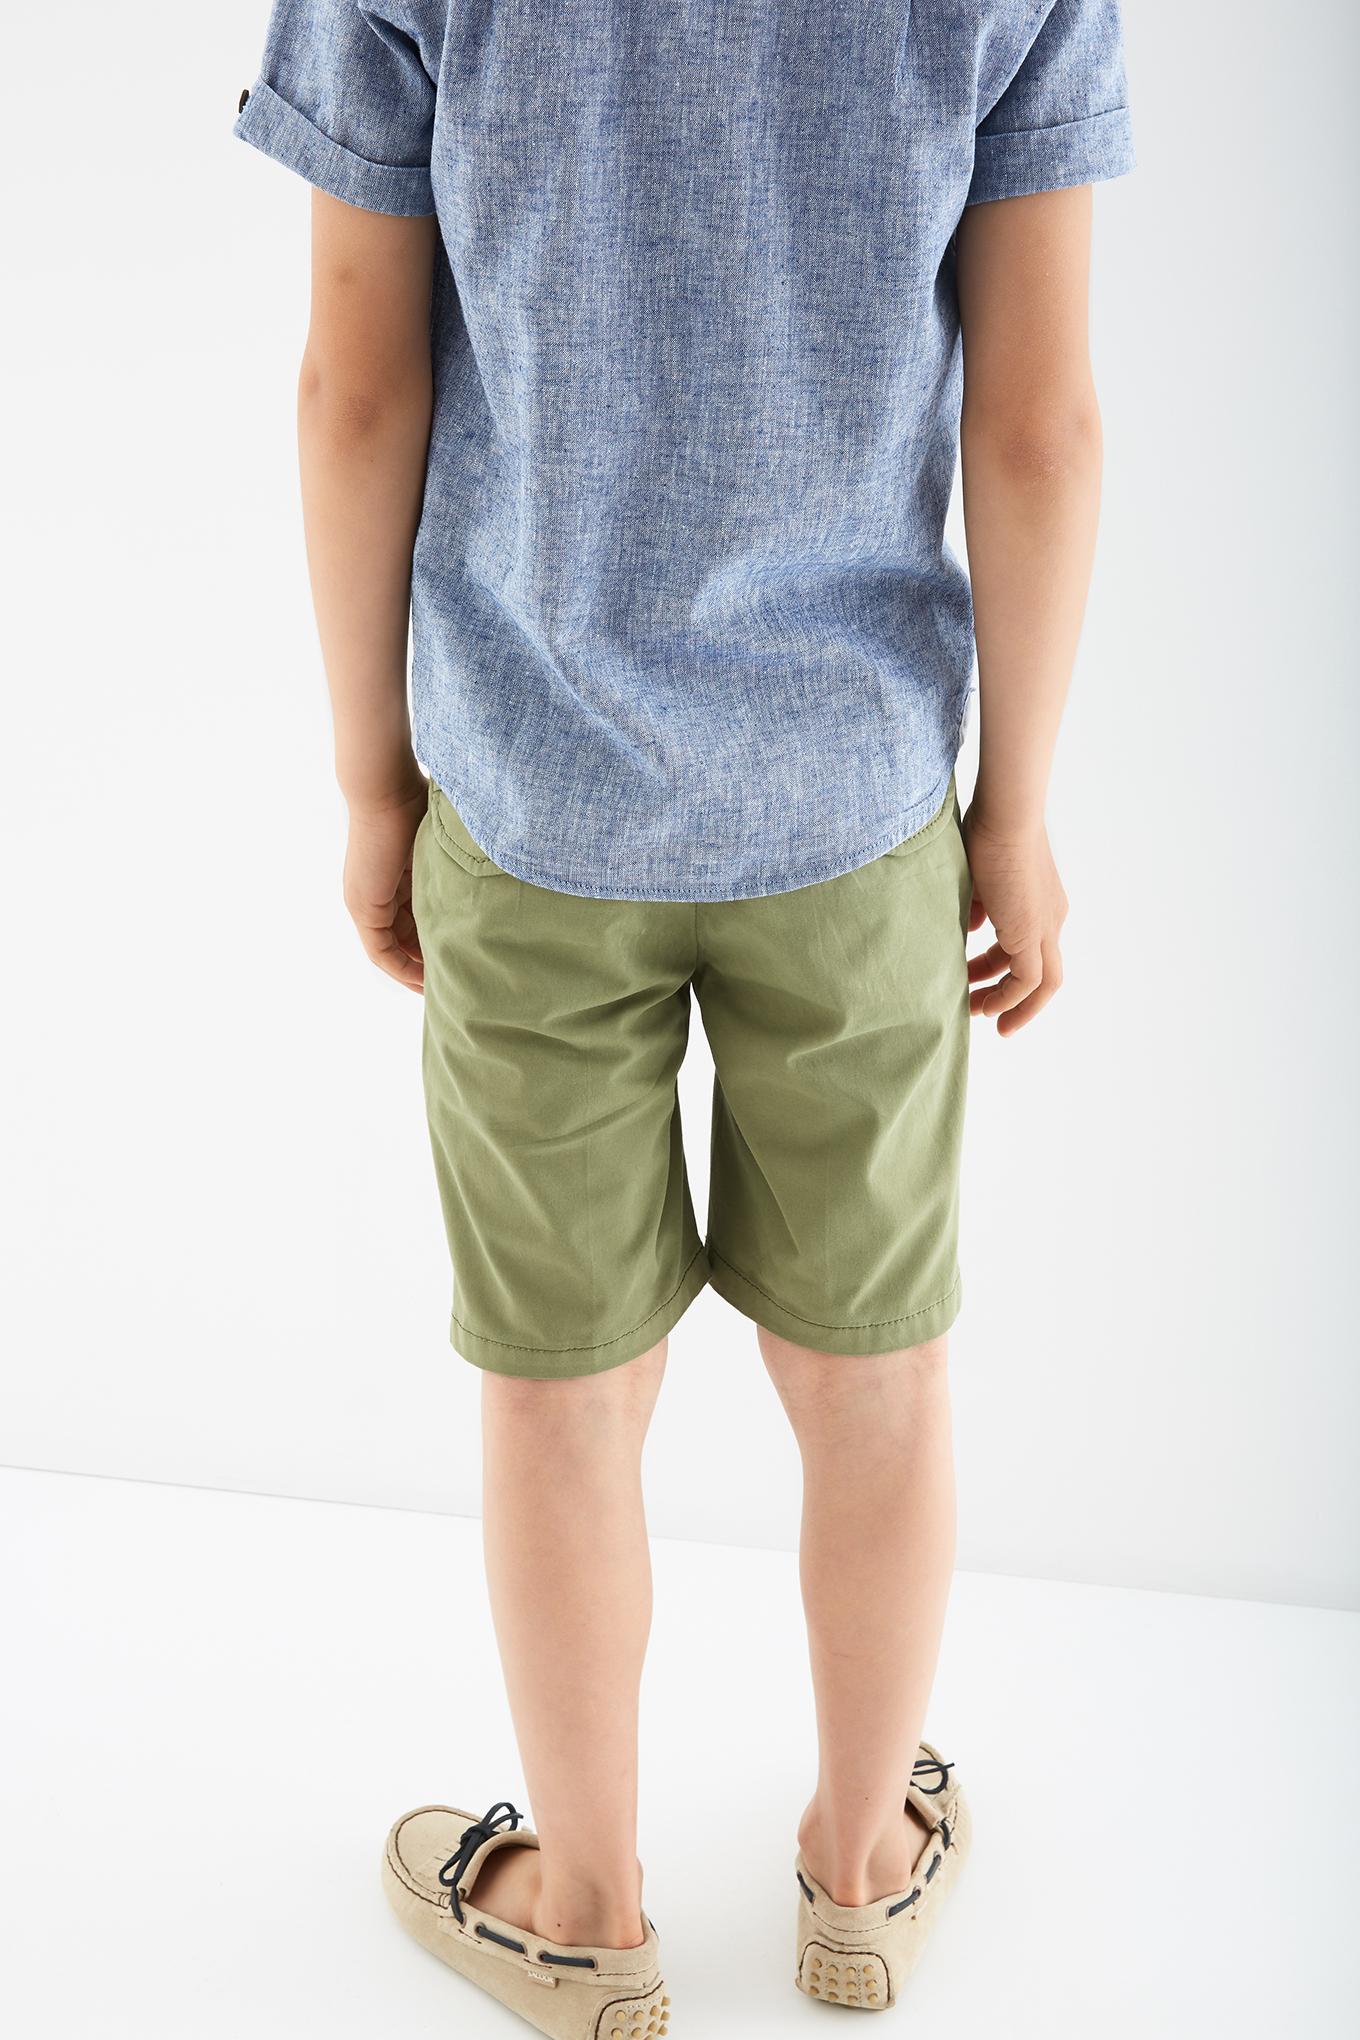 Bermuda Green Casual Boy